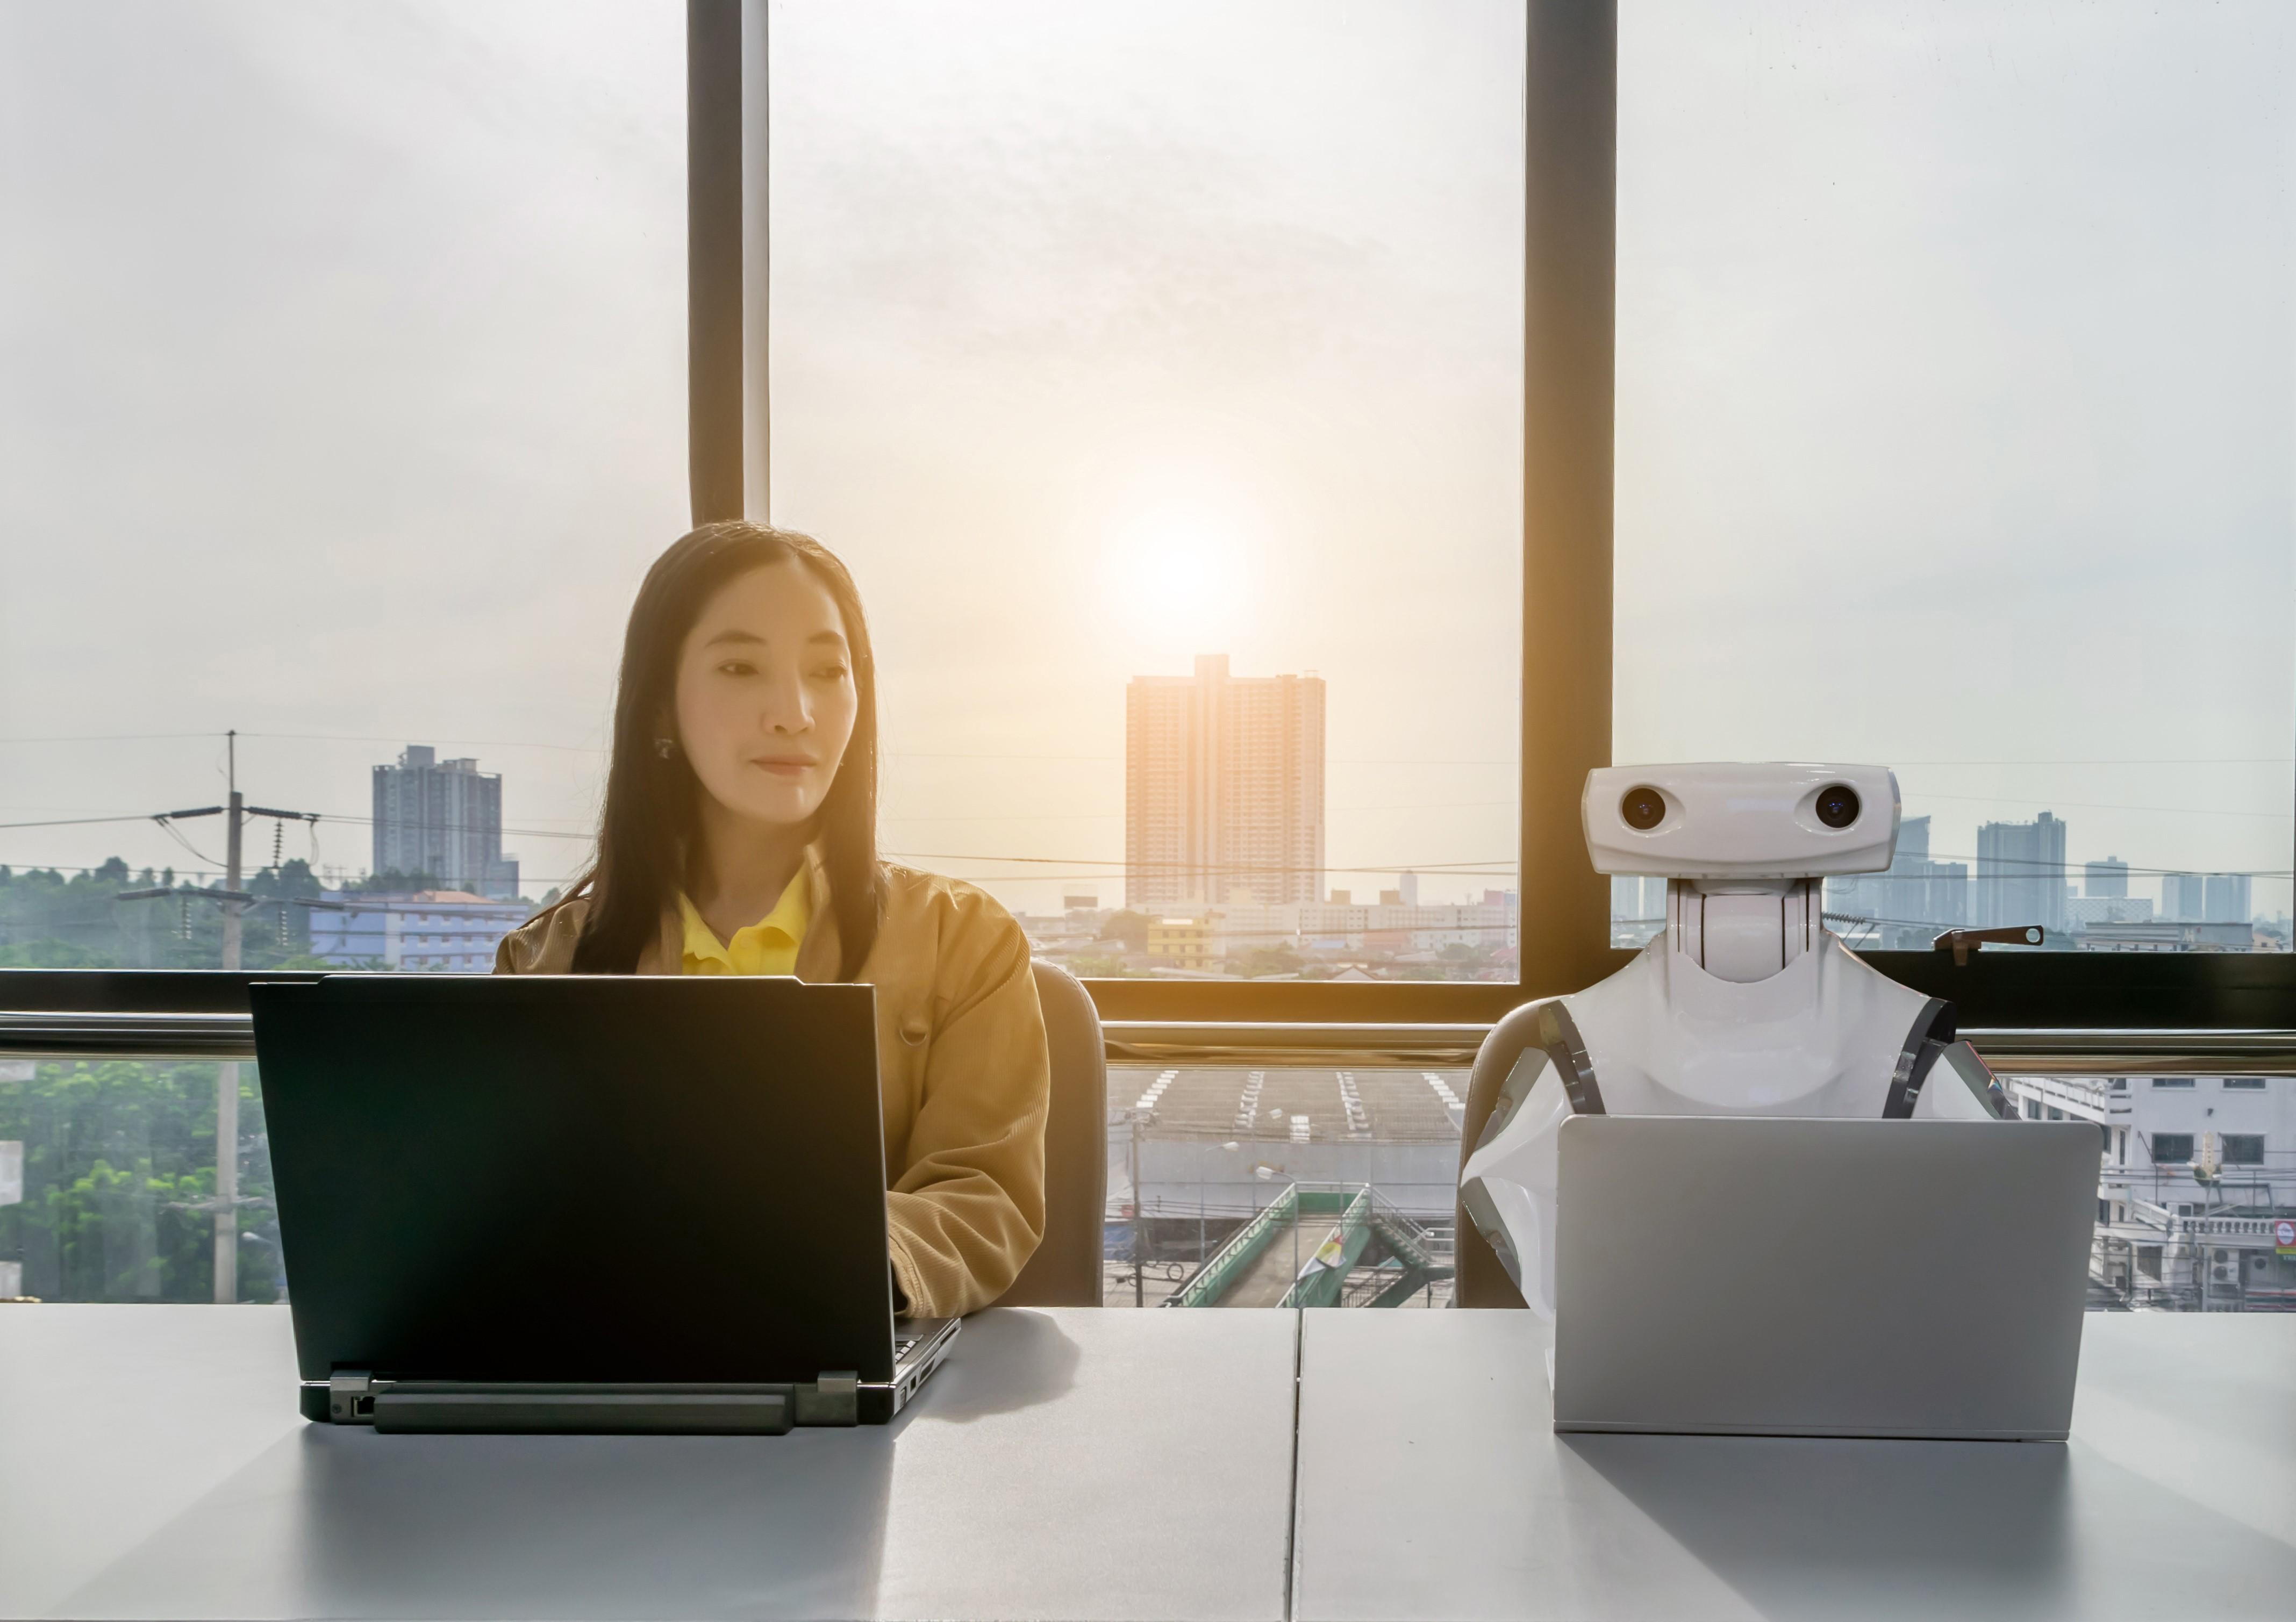 Future of work: Robo efficiency beats human creativity?